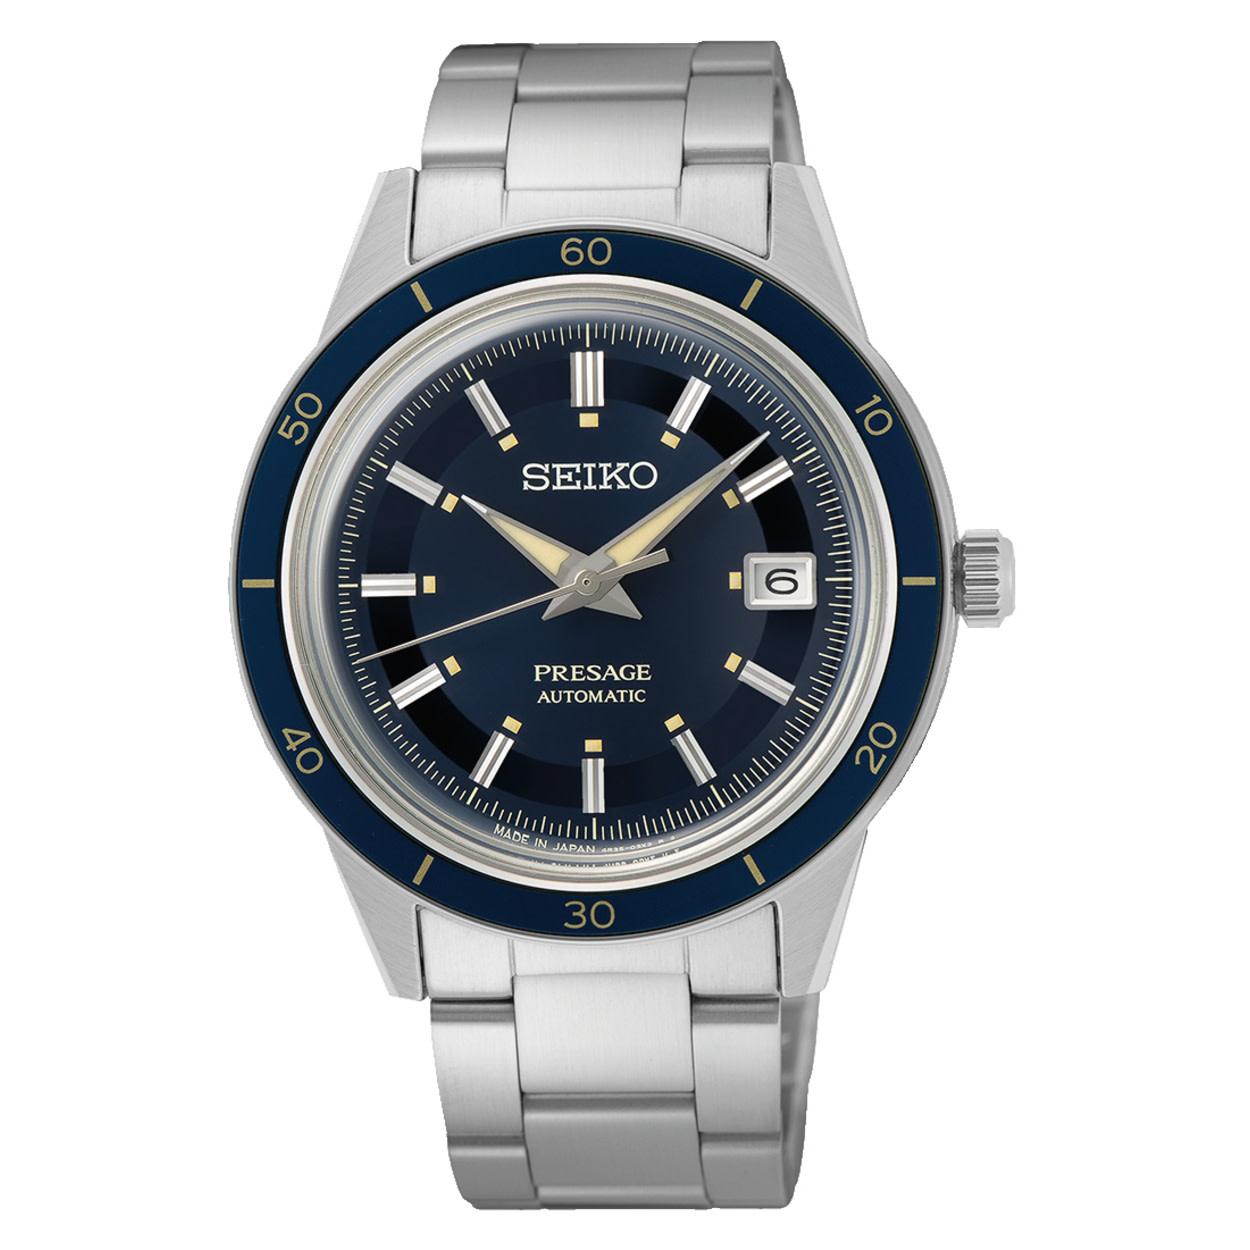 Seiko Seiko horloge Presage automaat SRPG05J1